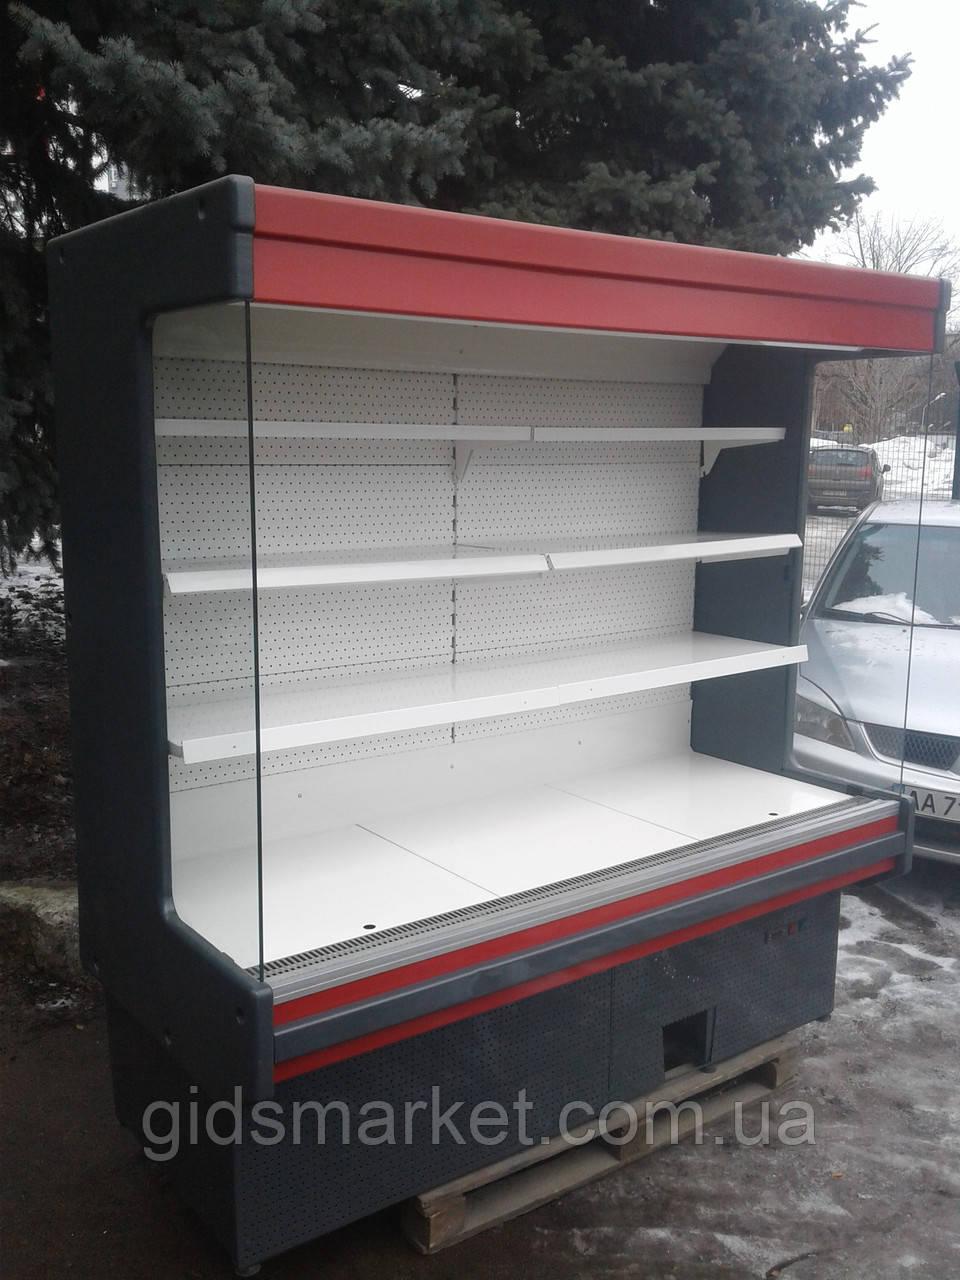 Холодильная горка Byfuch 2 м.б/у.  регал холодильній бу